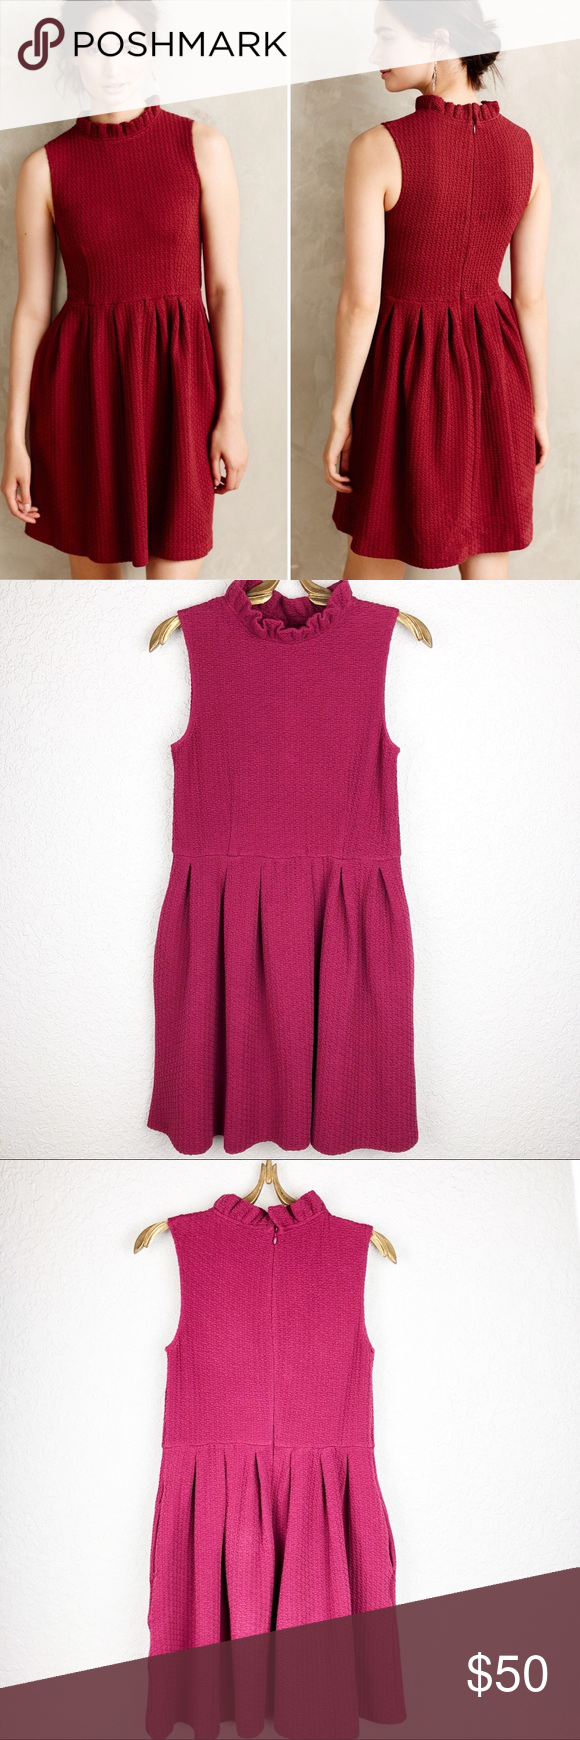 963c0966 Ganni dress Ganni Anthropologie Dresses | My Posh Closet | Dresses ...